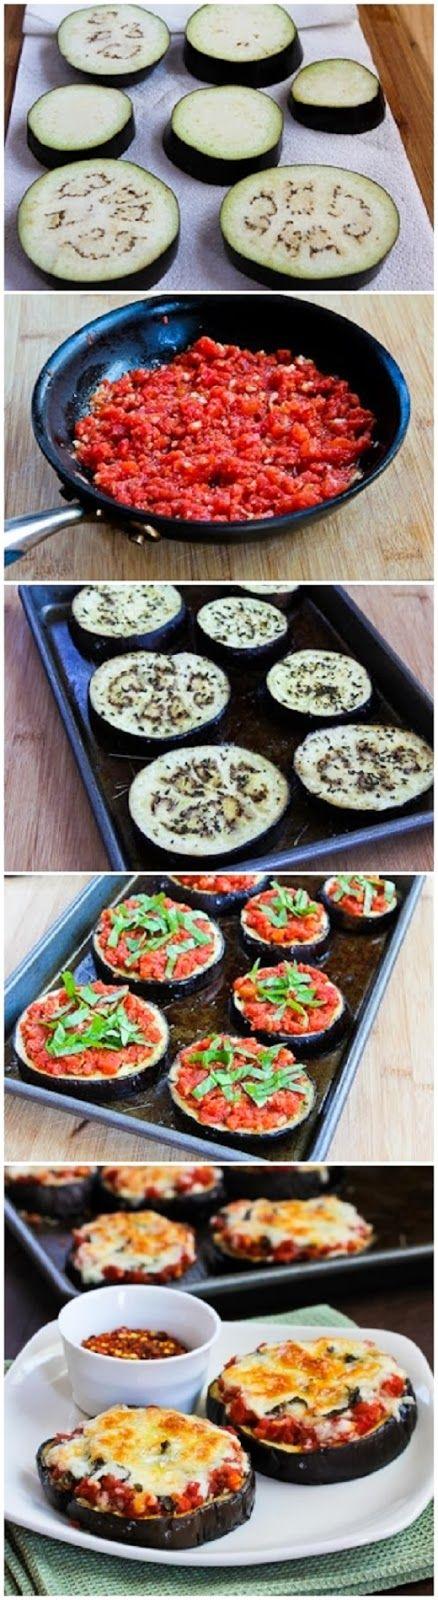 Focuseat: Eggplant Pizzas…use daiya cheese